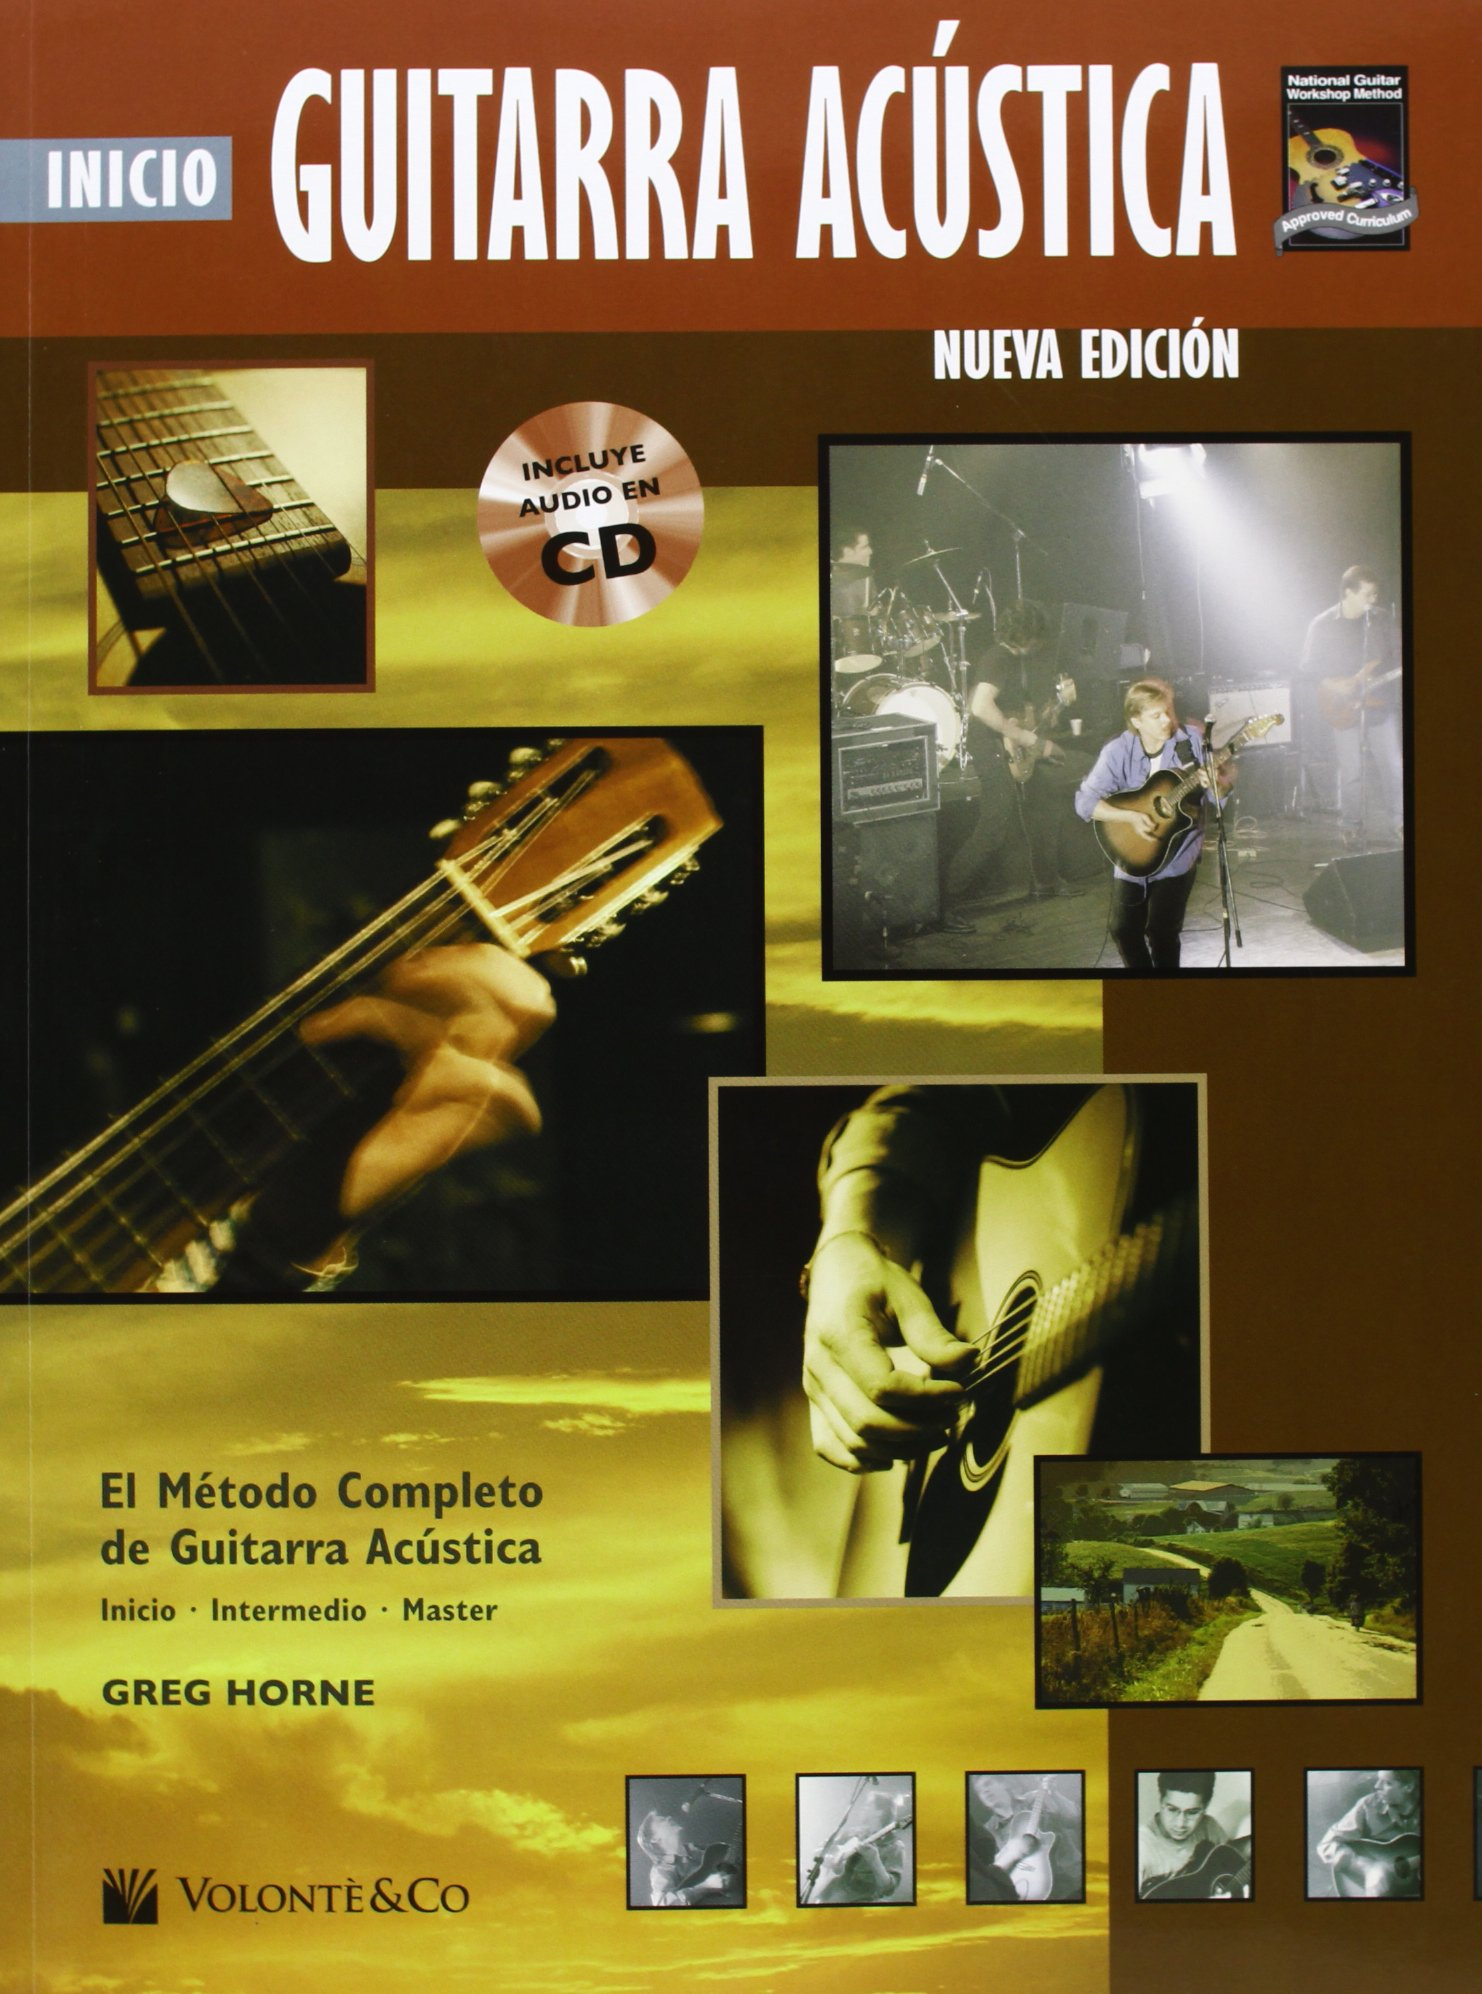 GUITARRA ACUSTICA INICIO + CD (Didattica musicali): Amazon.es: Horne Greg: Libros